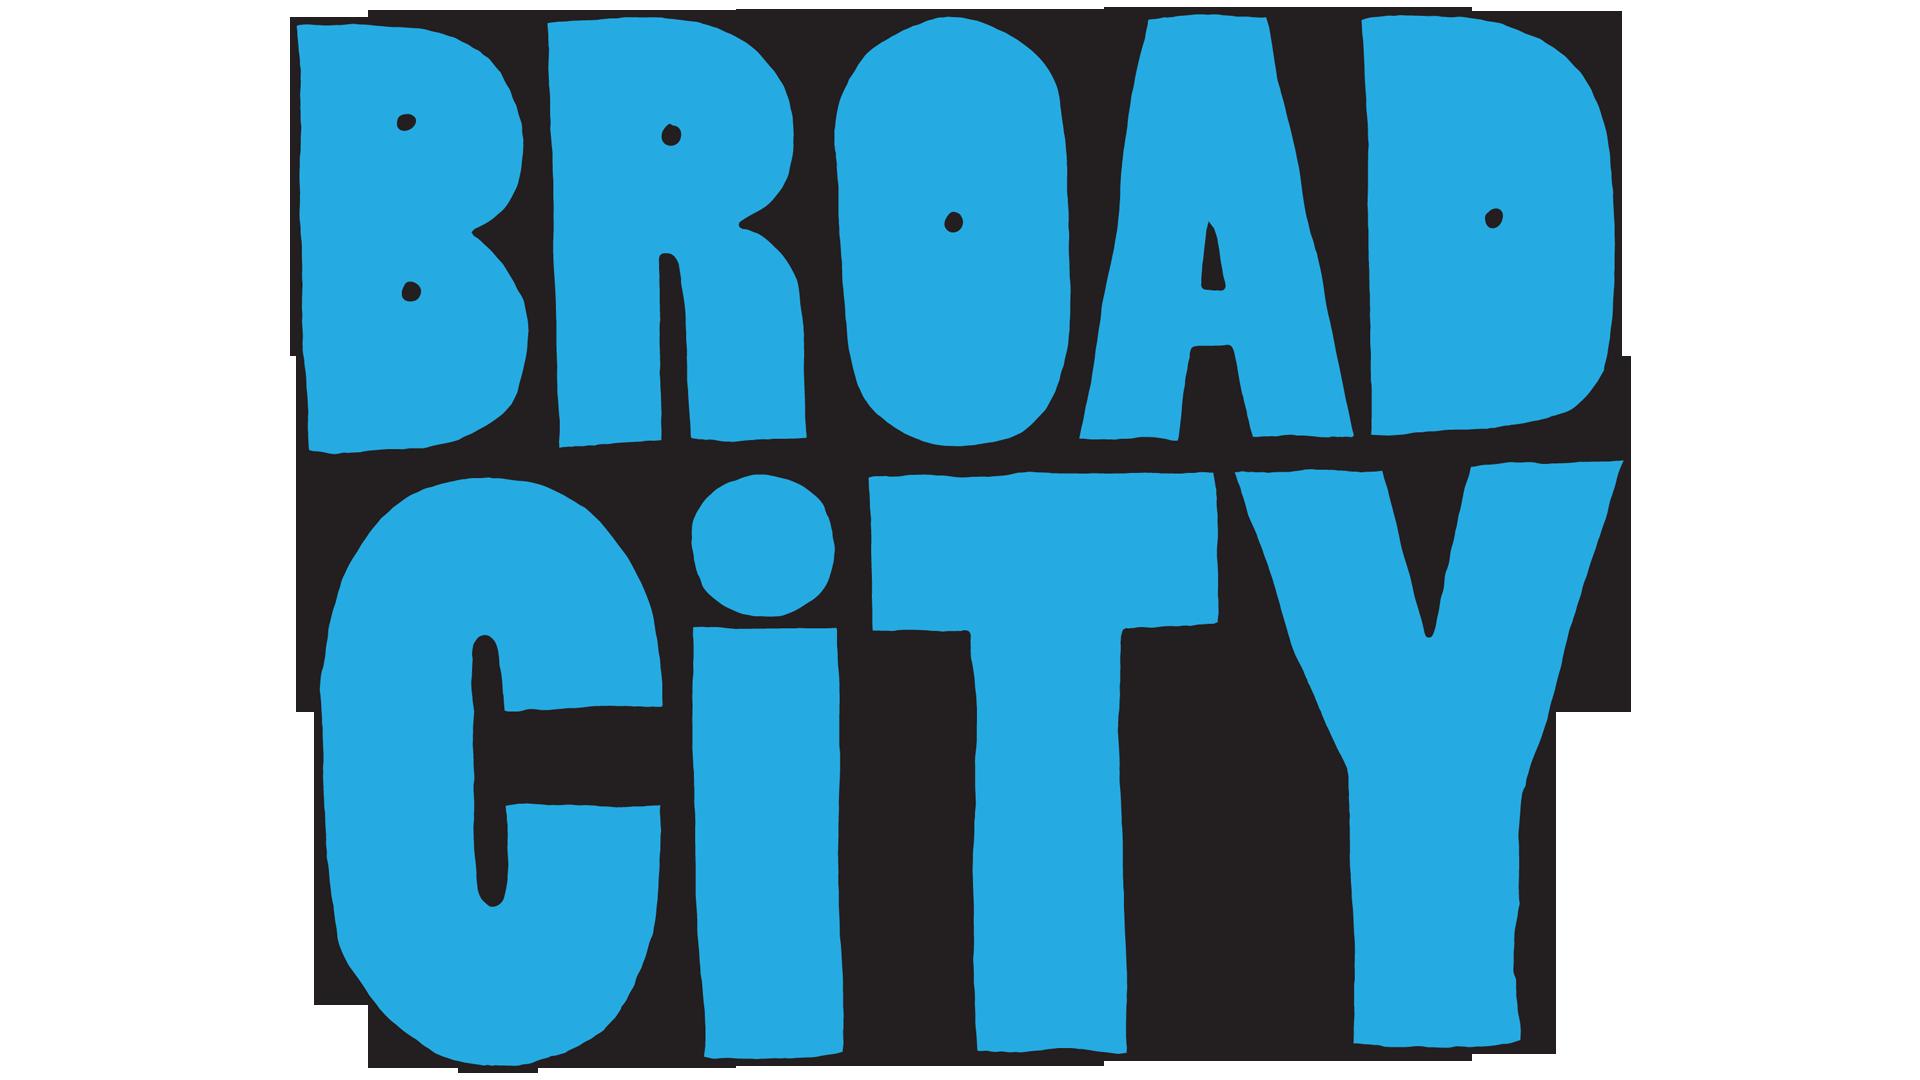 broad-city-ldl-.png